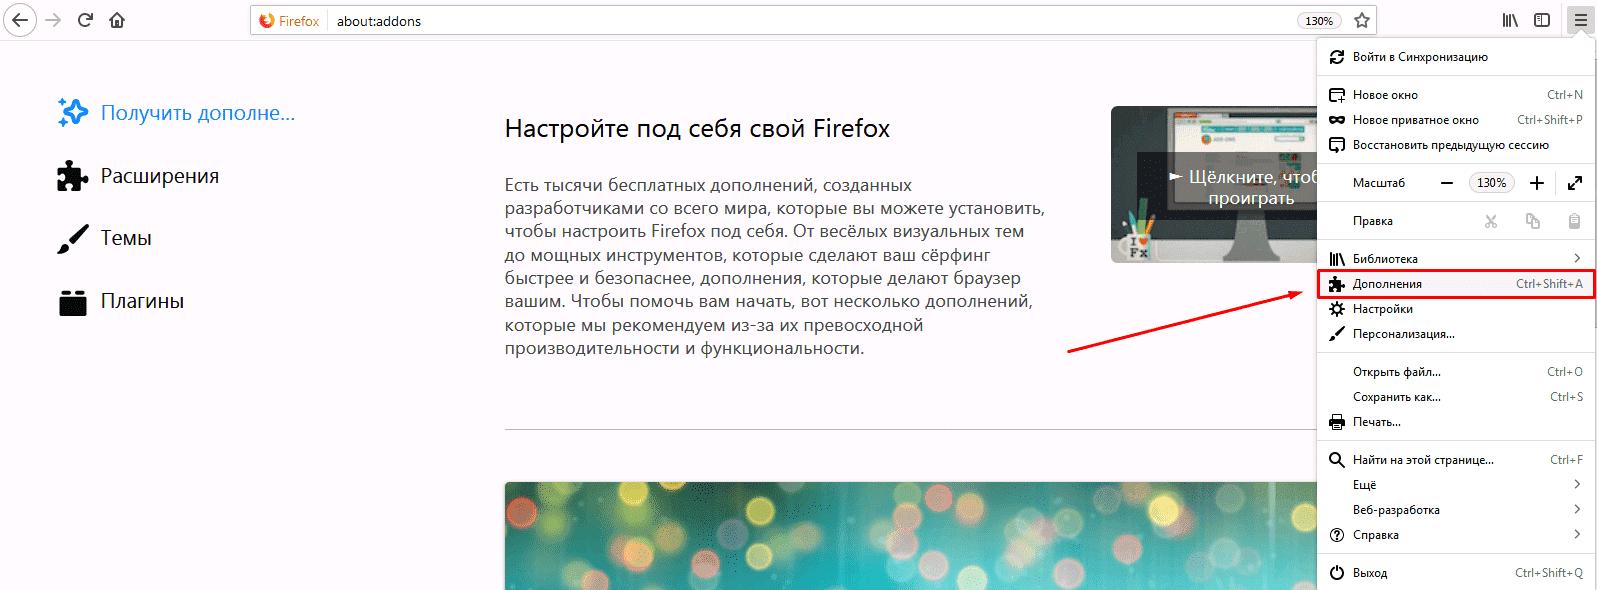 ZenMate в Mozilla Firefox